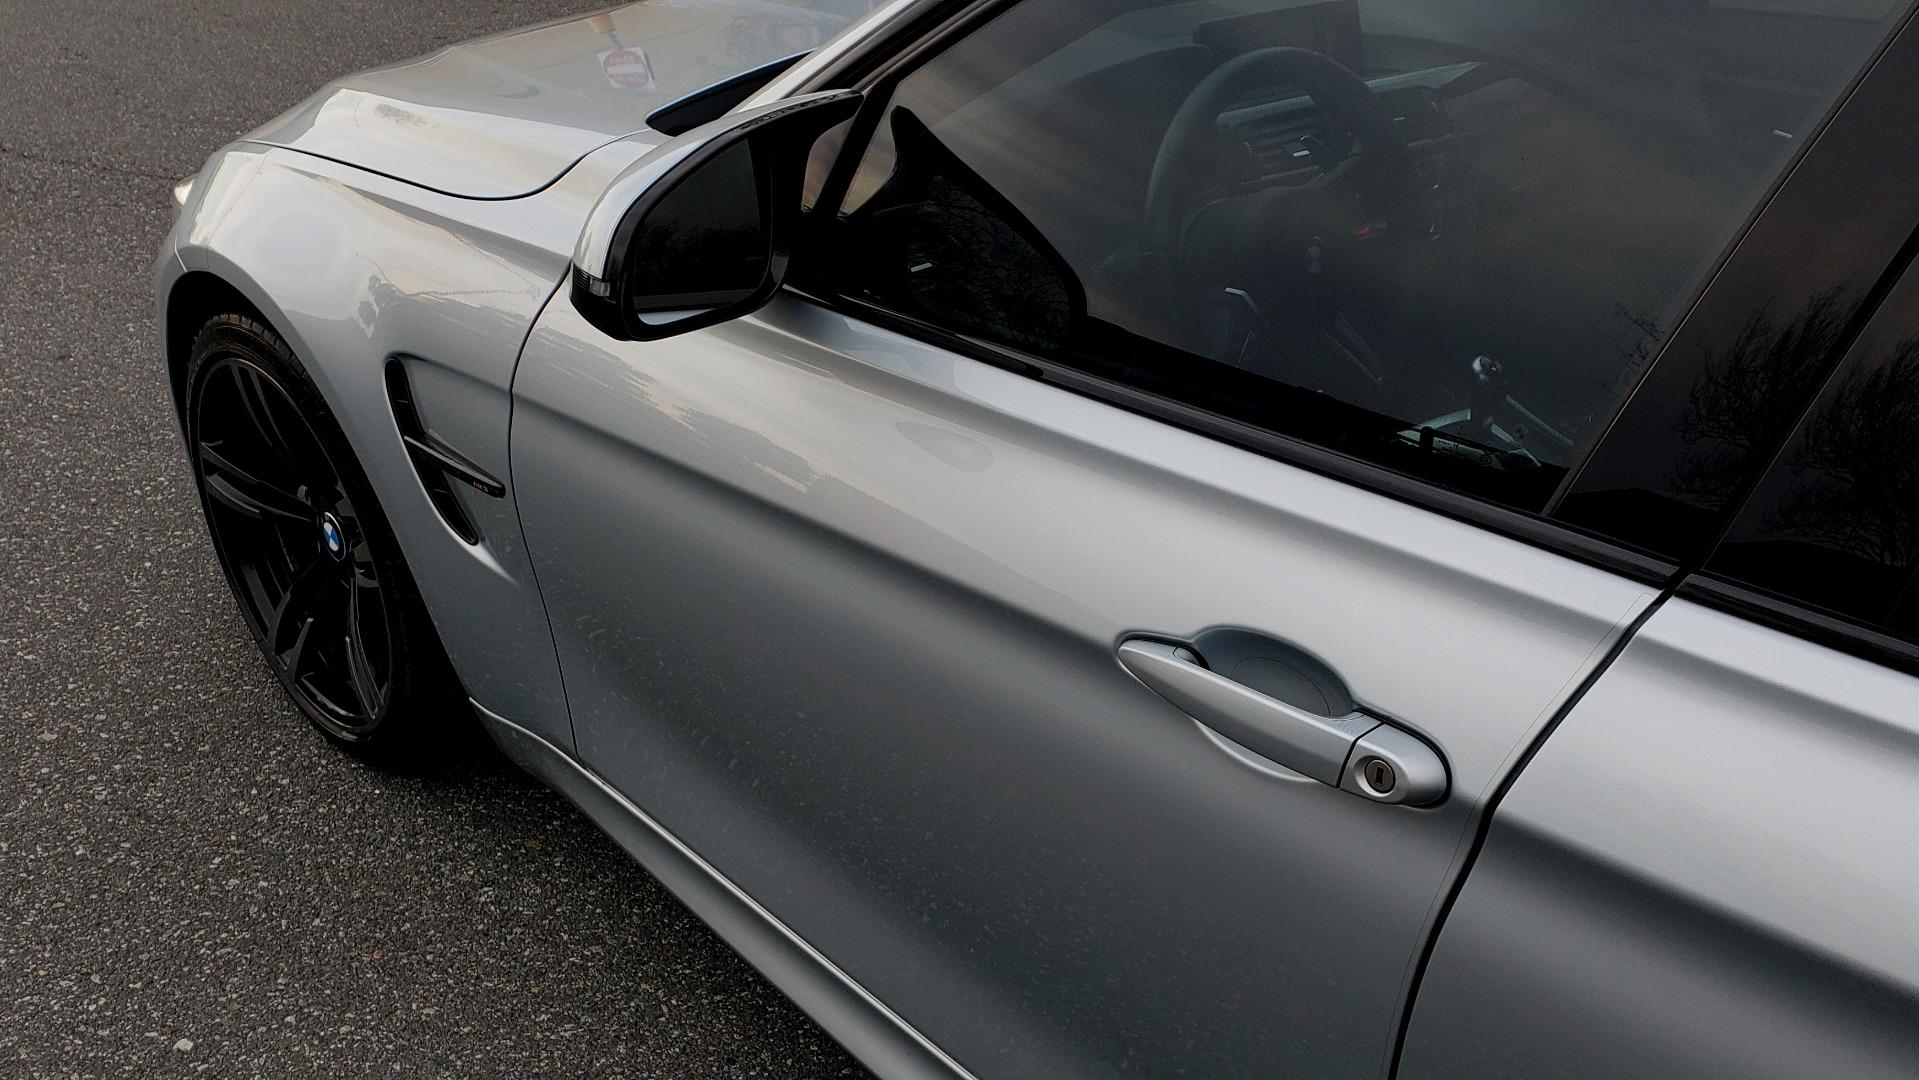 Used 2015 BMW M3 EXECUTIVE PKG / NAV / CAMERA / HUD / CARBON FIBER ROOF for sale Sold at Formula Imports in Charlotte NC 28227 25